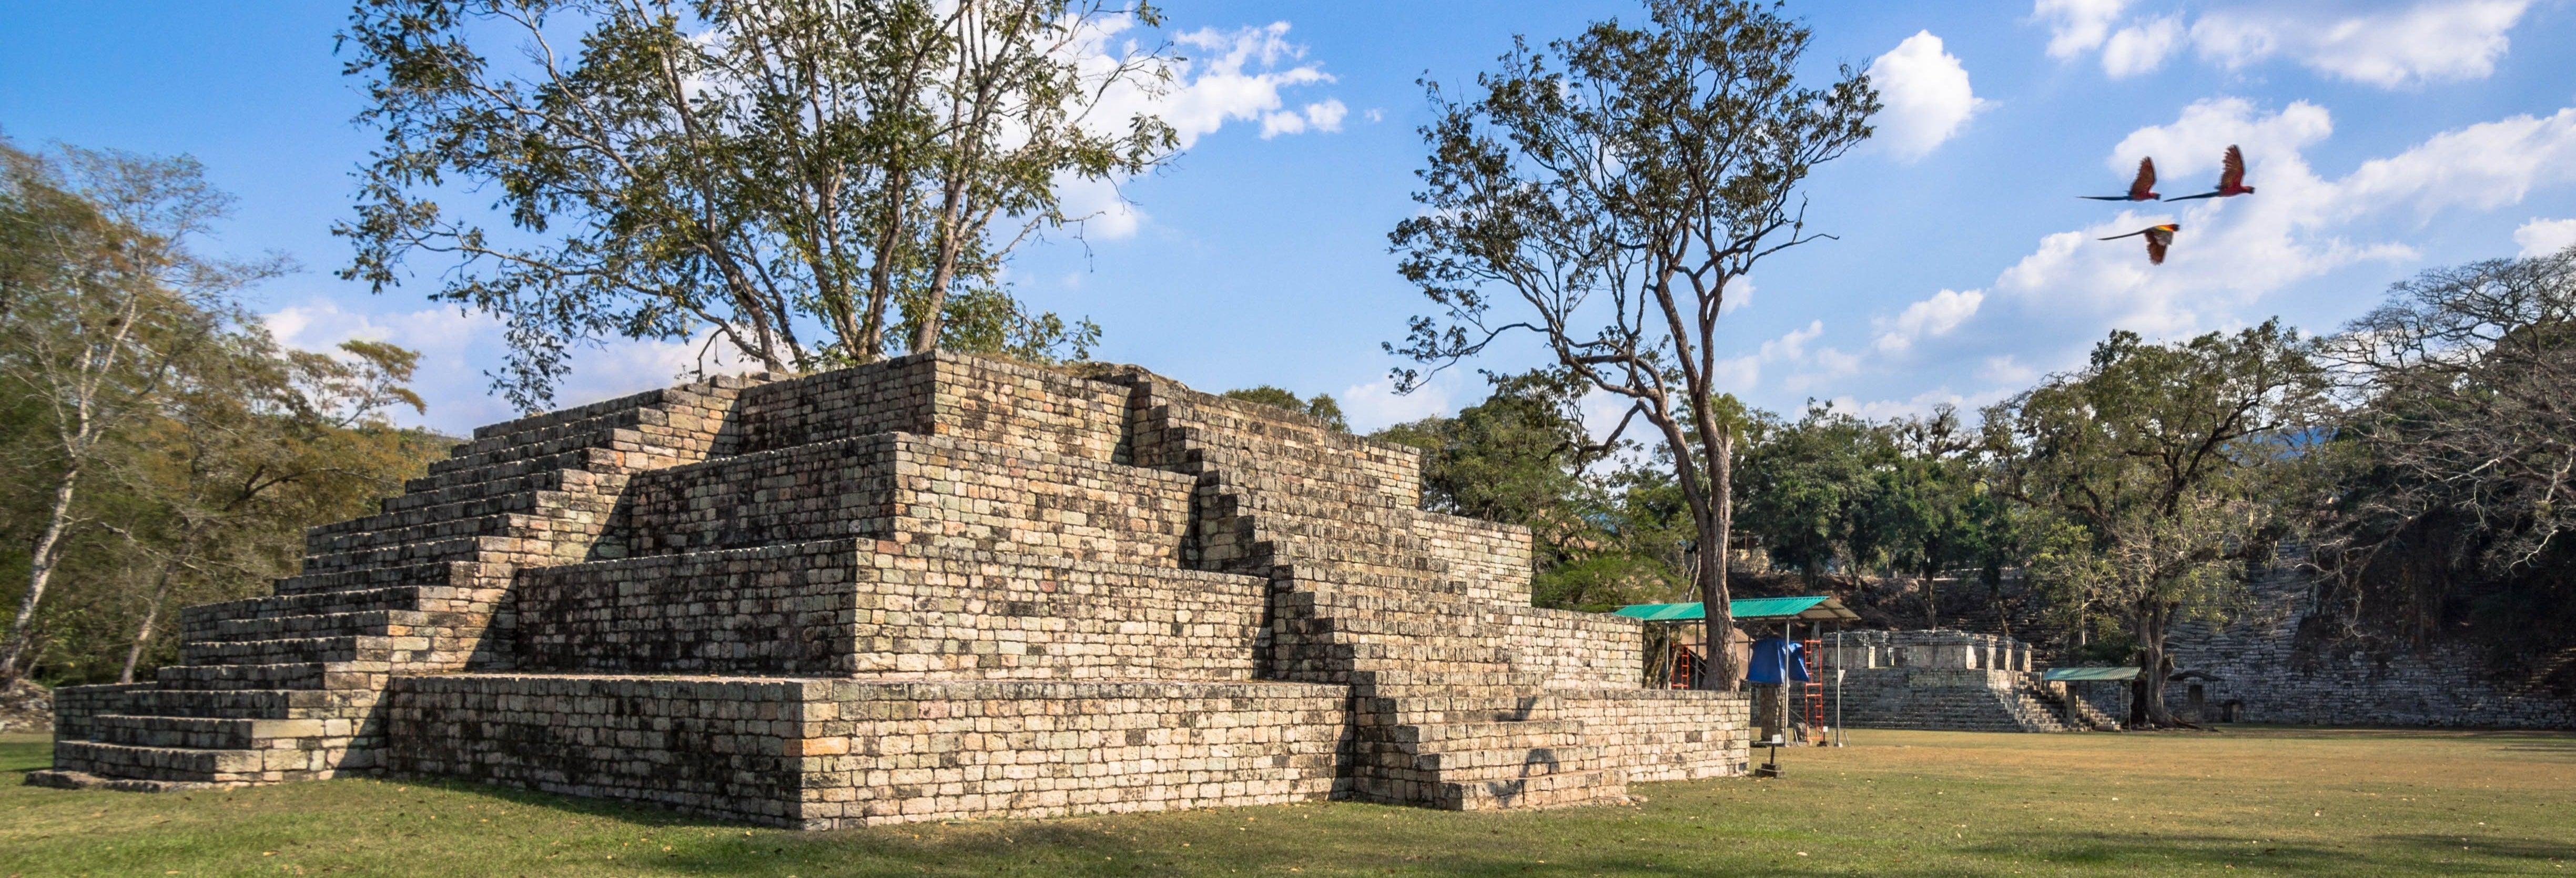 Tour privado por Copán Ruinas